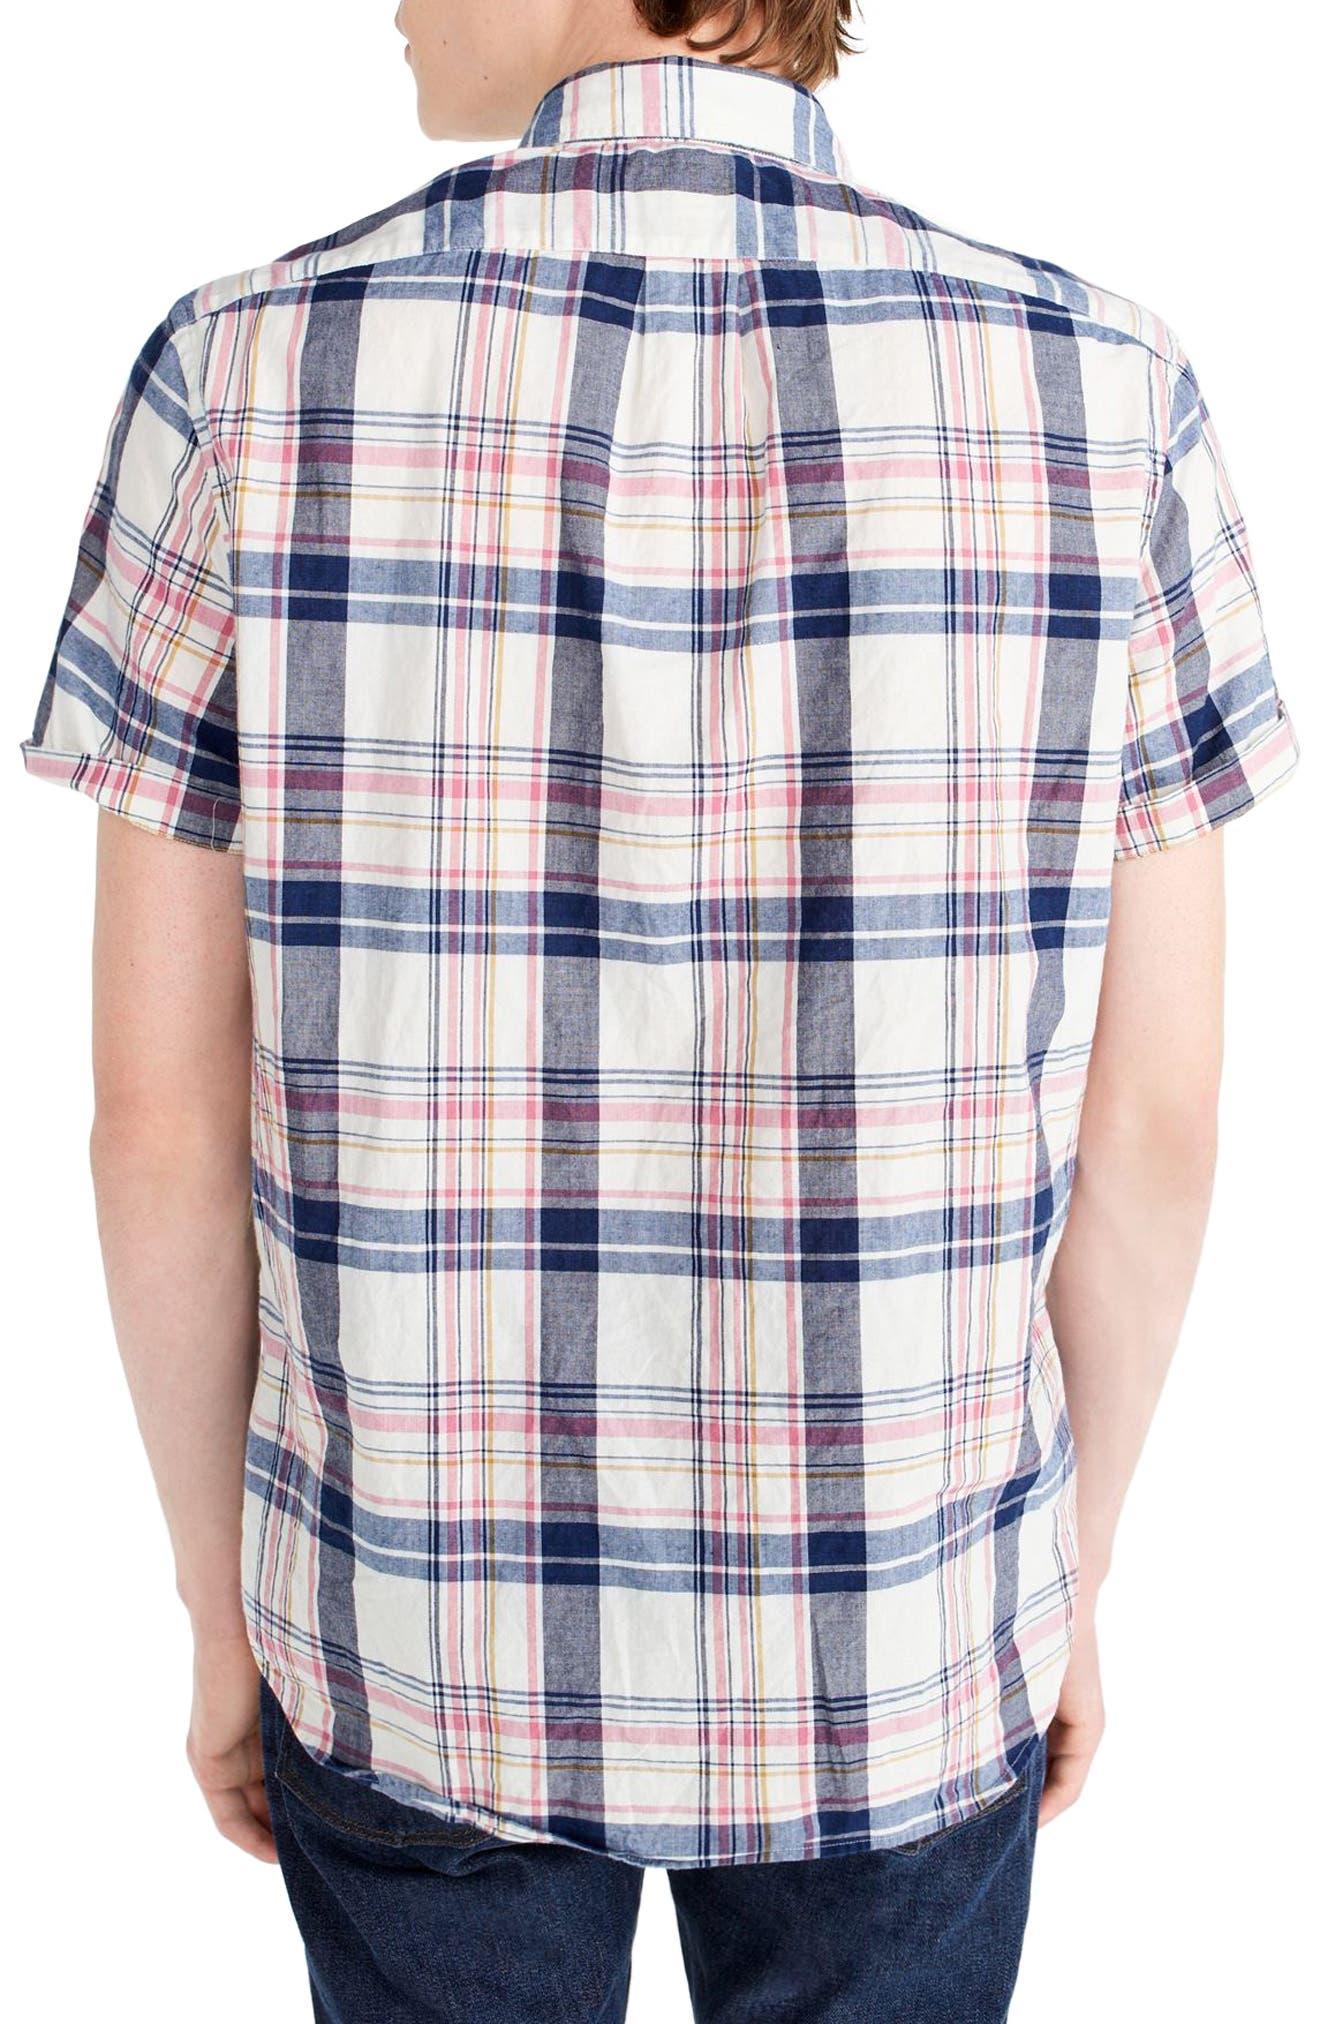 Indigo Plaid Short Sleeve Madras Shirt,                             Alternate thumbnail 2, color,                             Indigo Creme